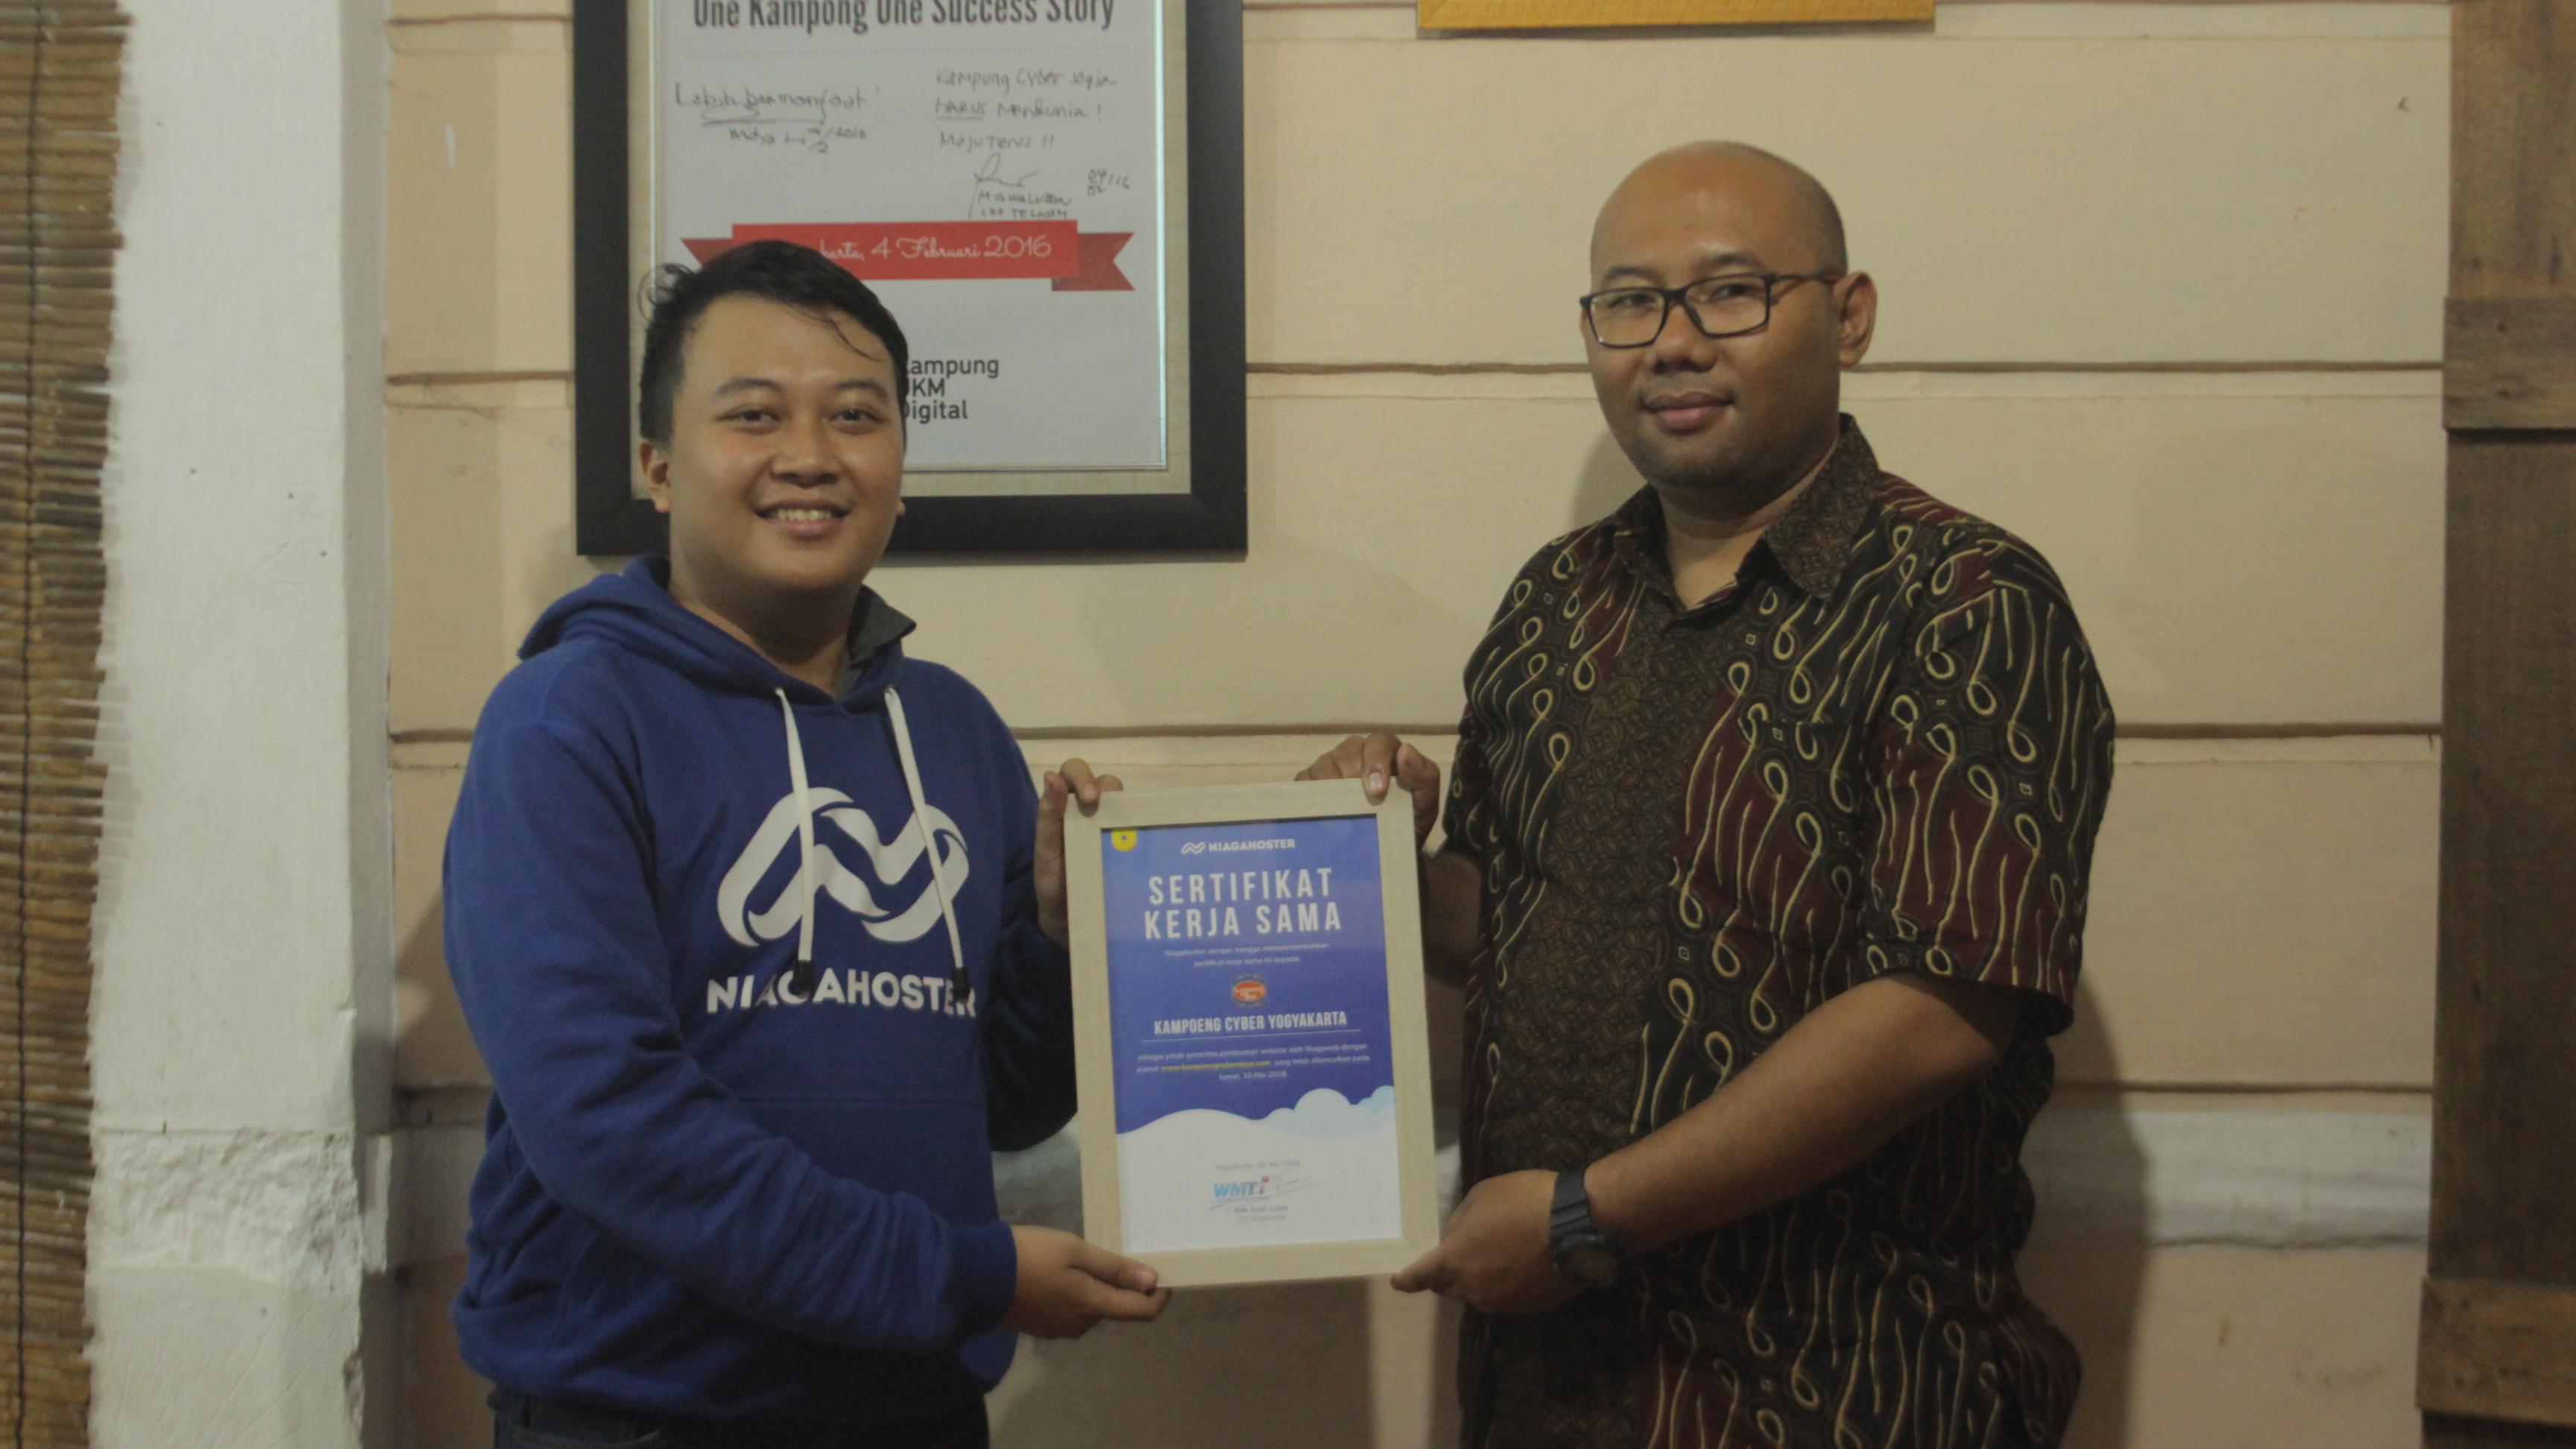 Penyerahan sertifikat kerja sama dari Niaga Hoster ke Kampoeng Cyber | Foto: Niaga Hoster